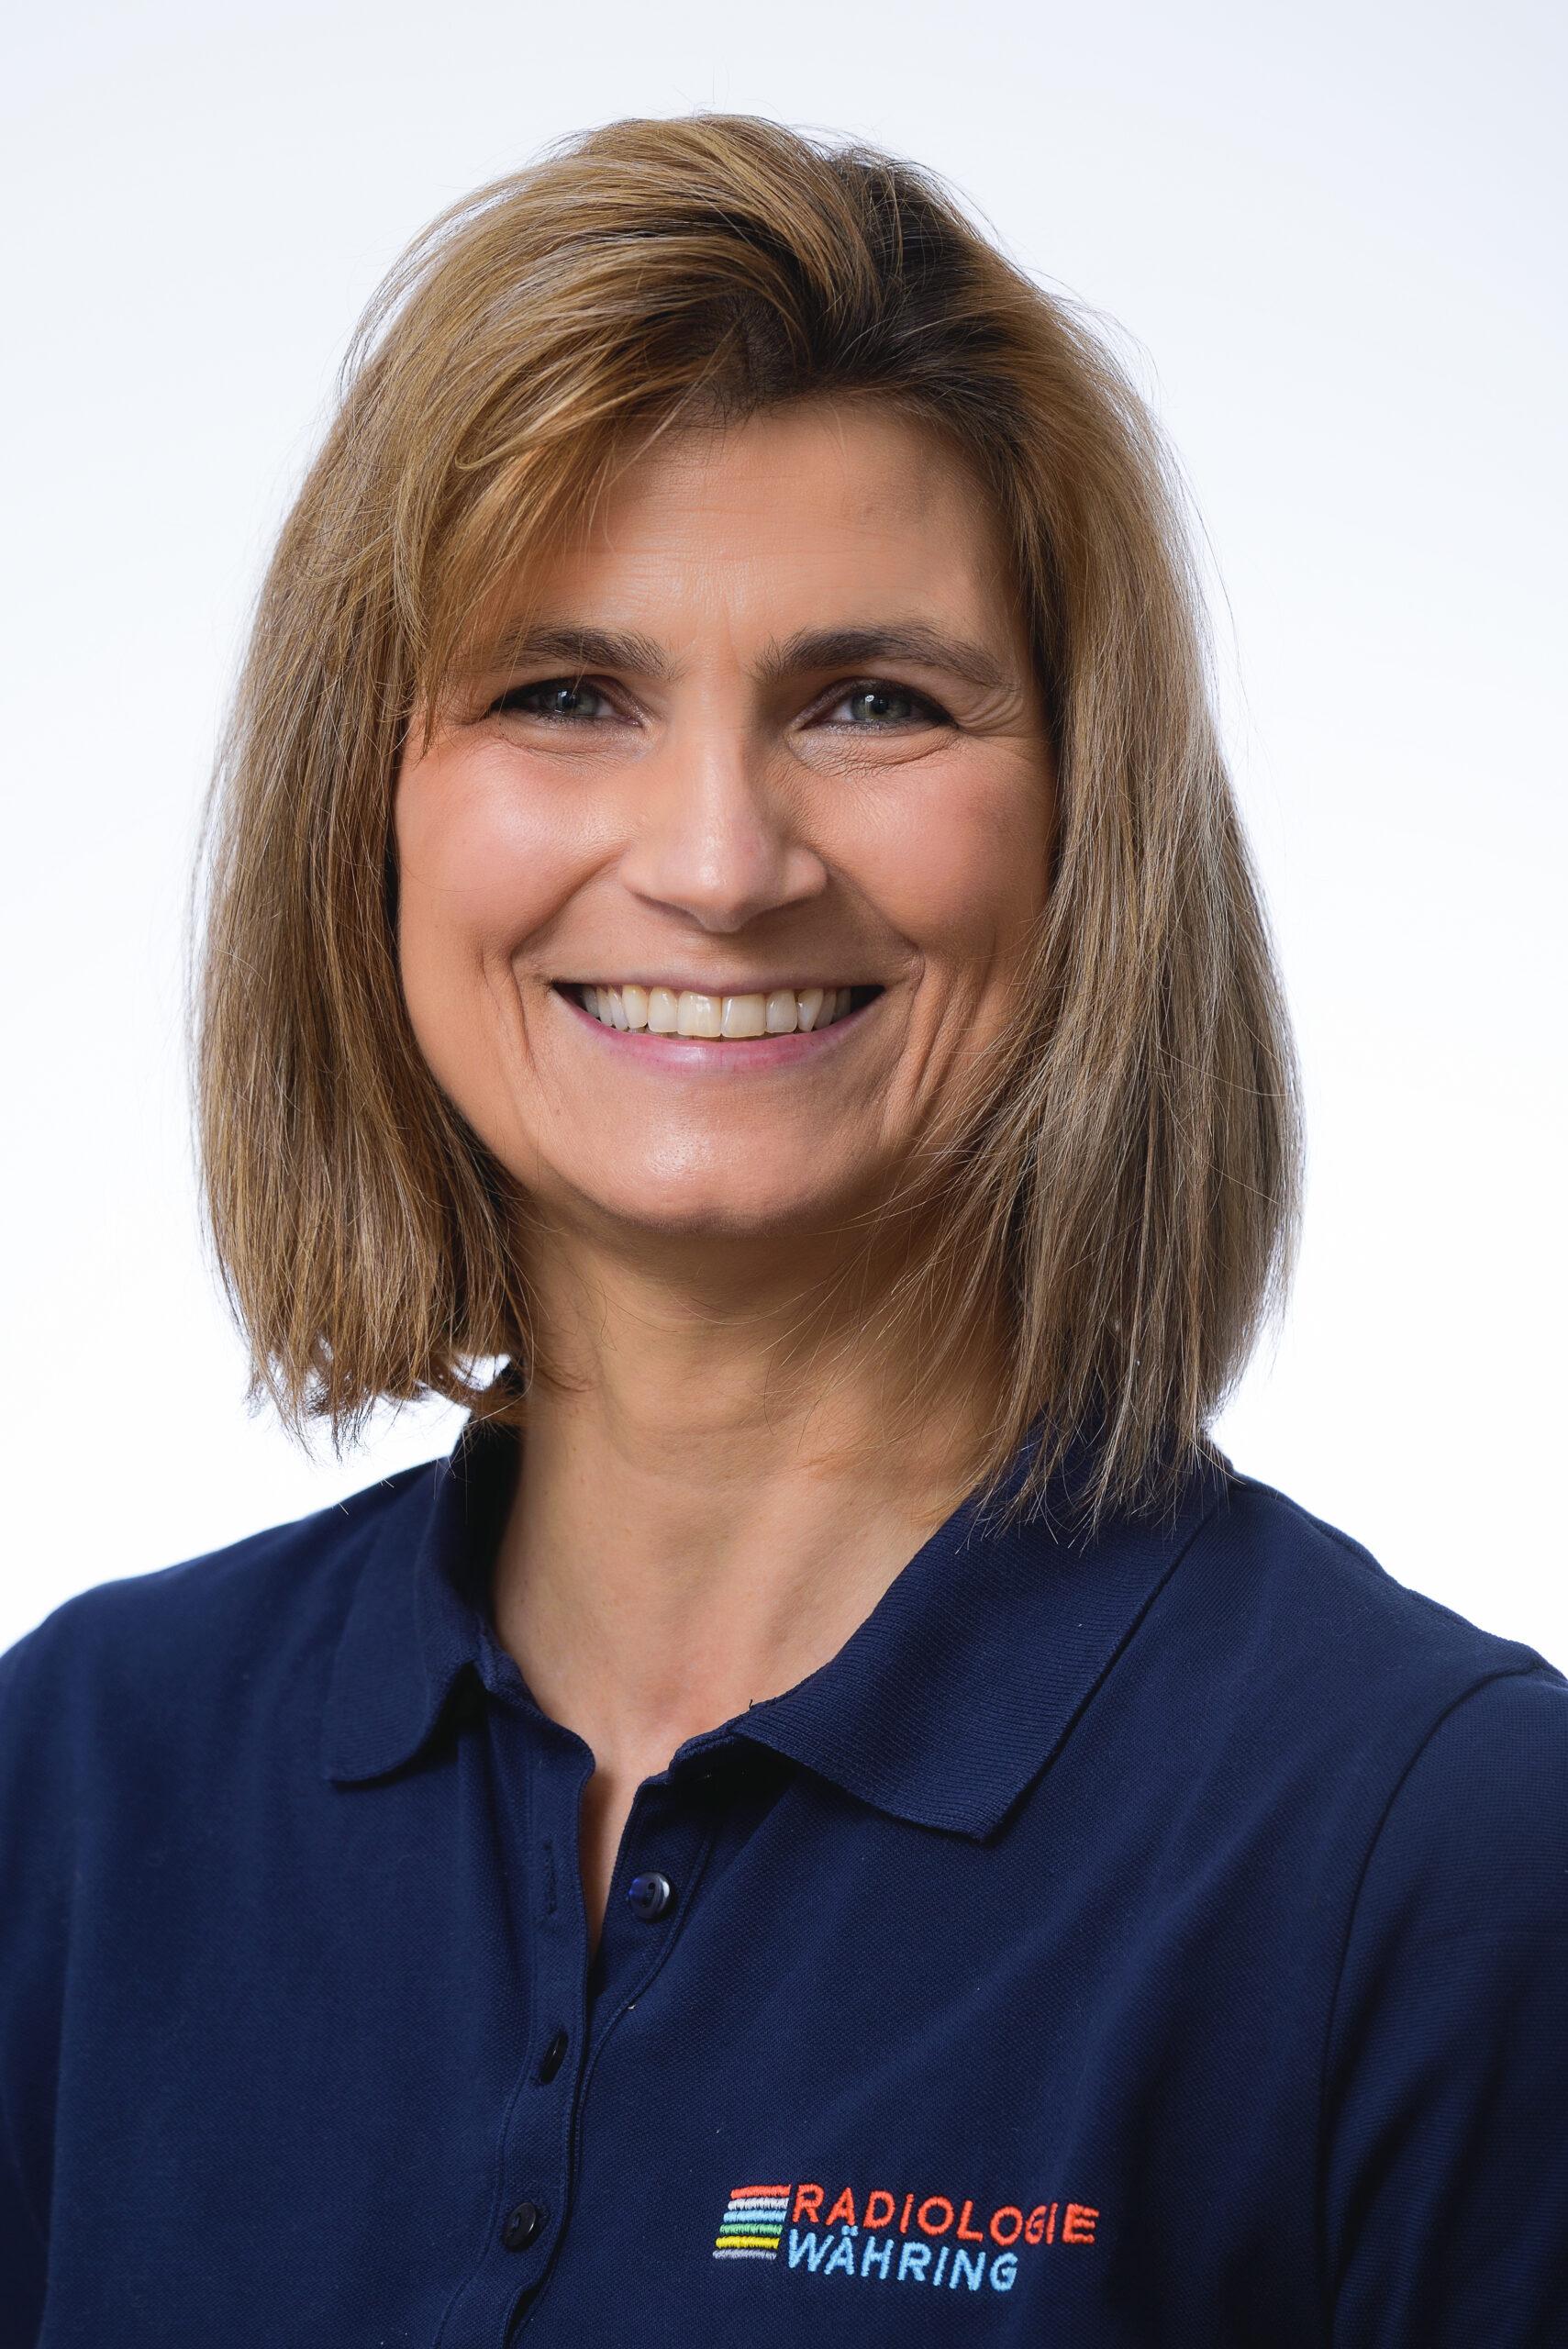 Susanne Danneshuber